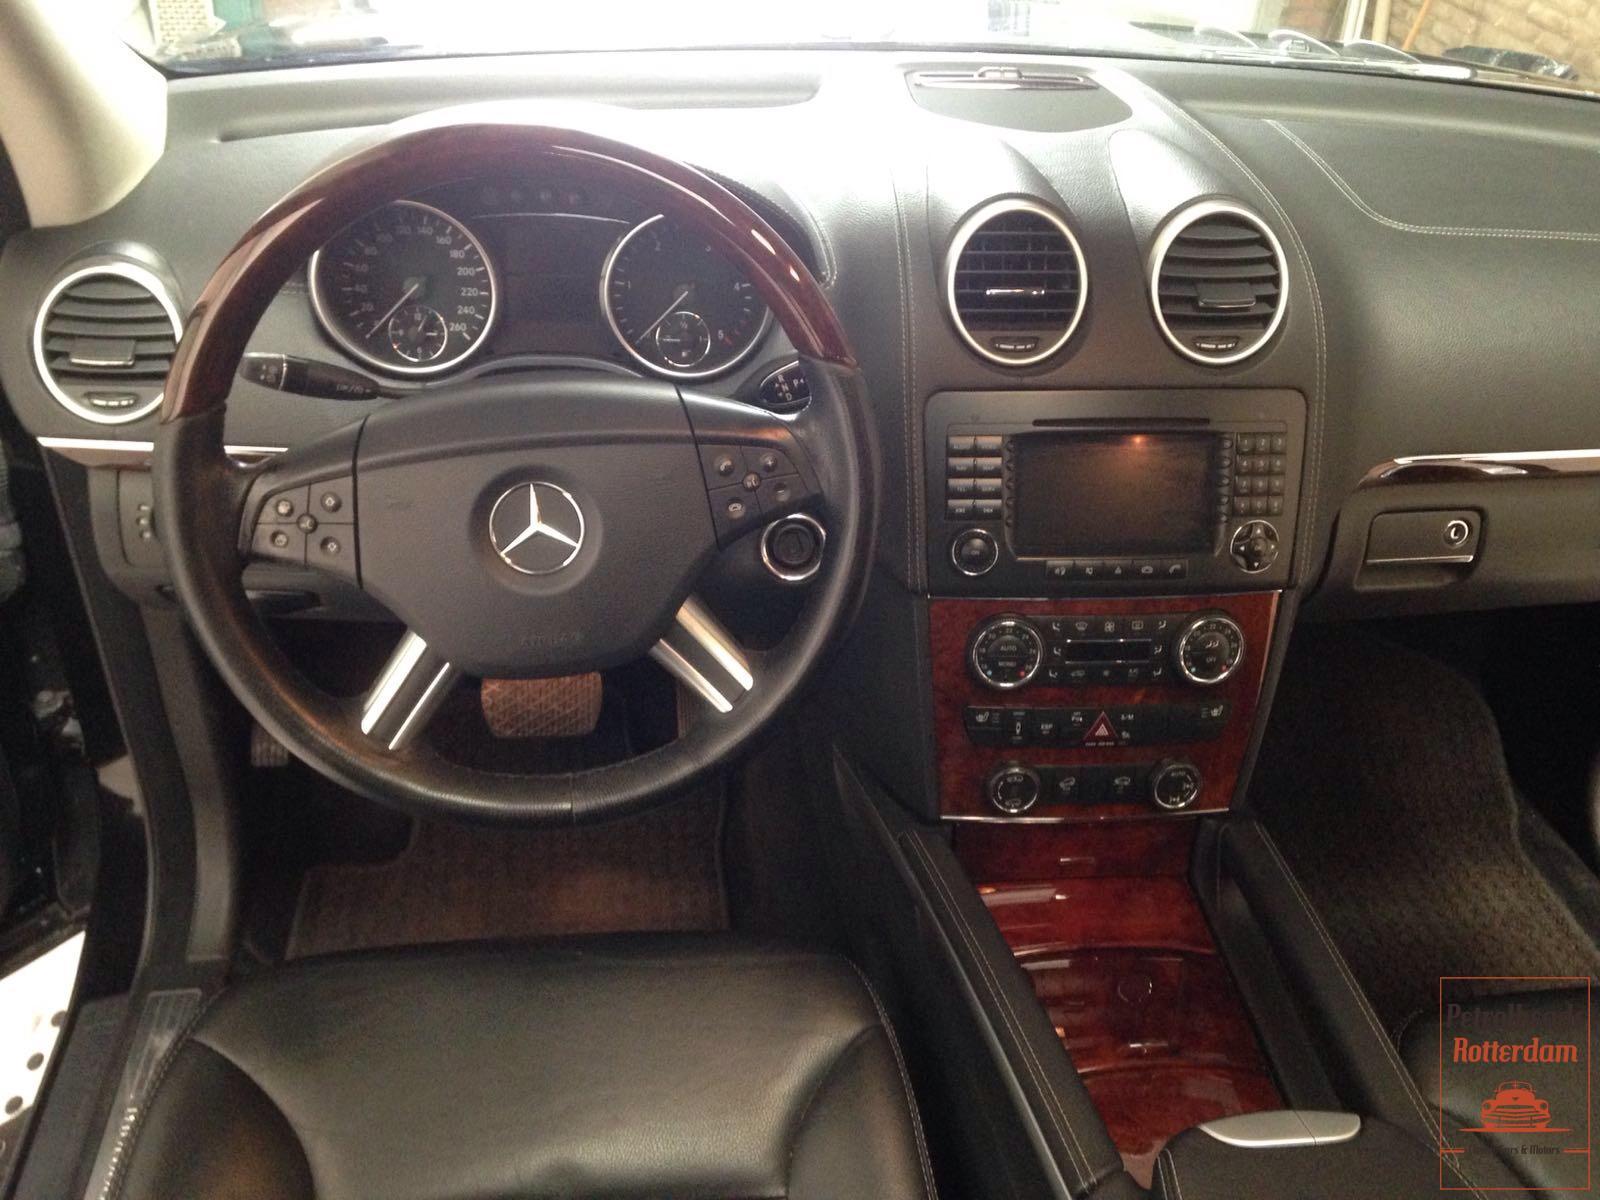 Mercedes GL320 CDI 4-Matic 2007 Interieur Front